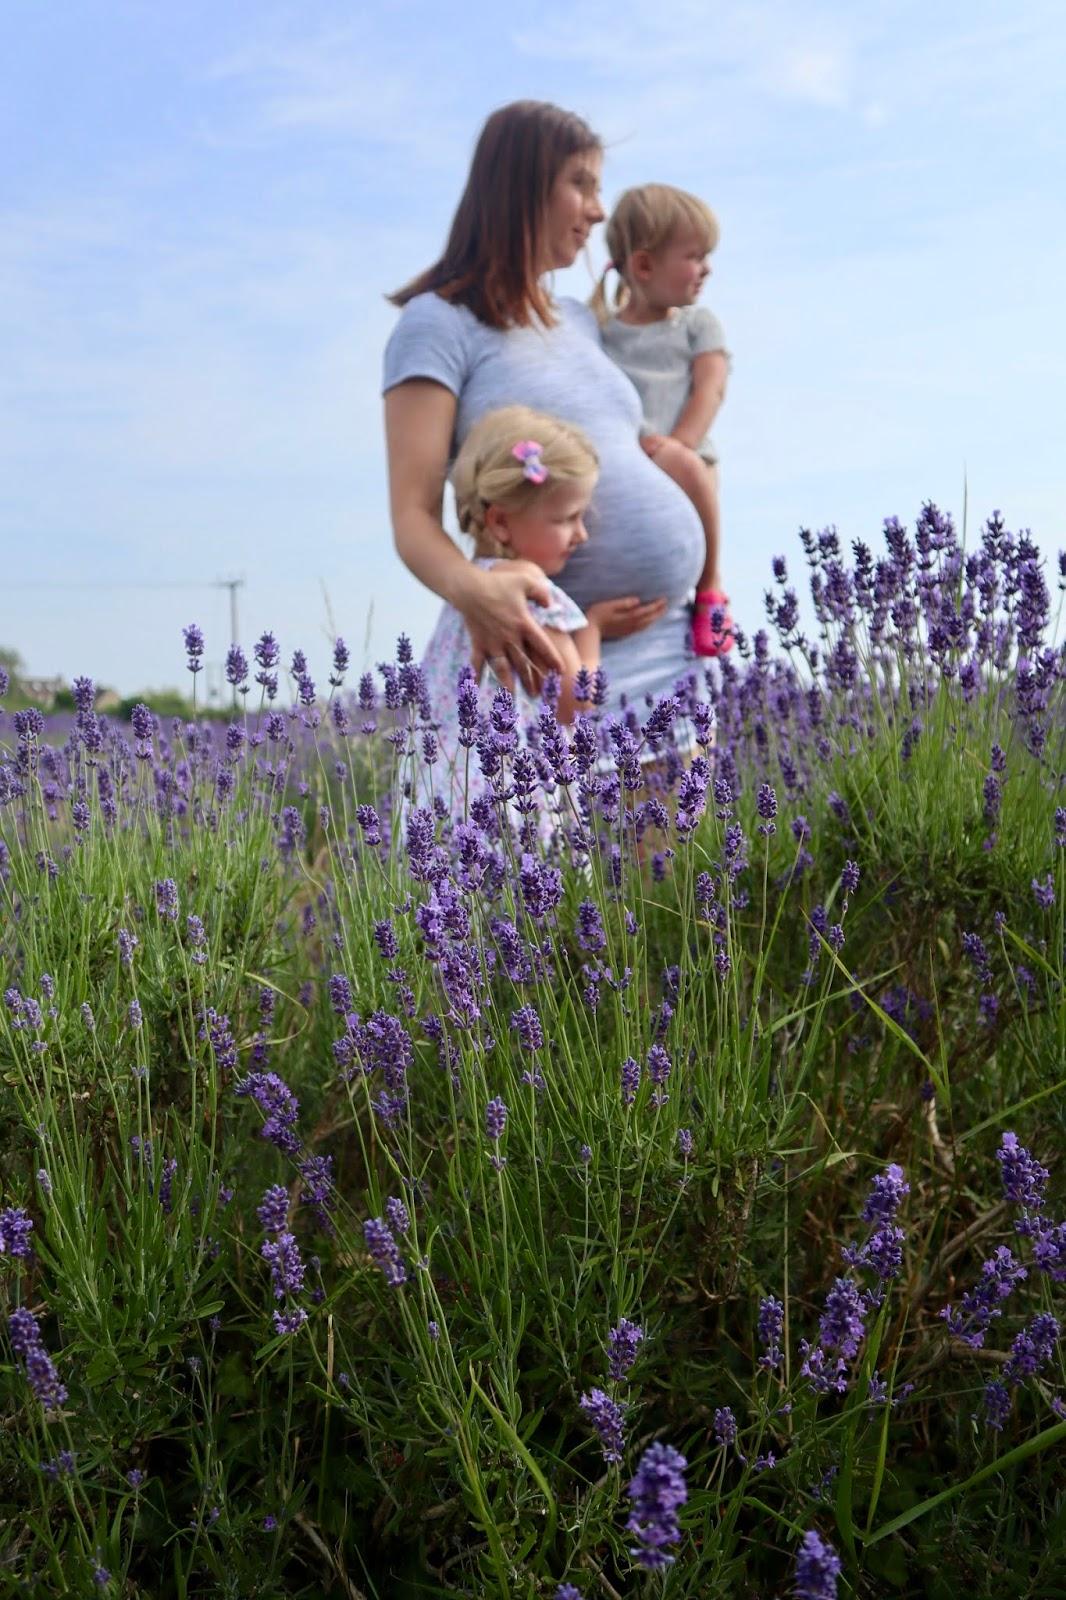 DIY maternity photos